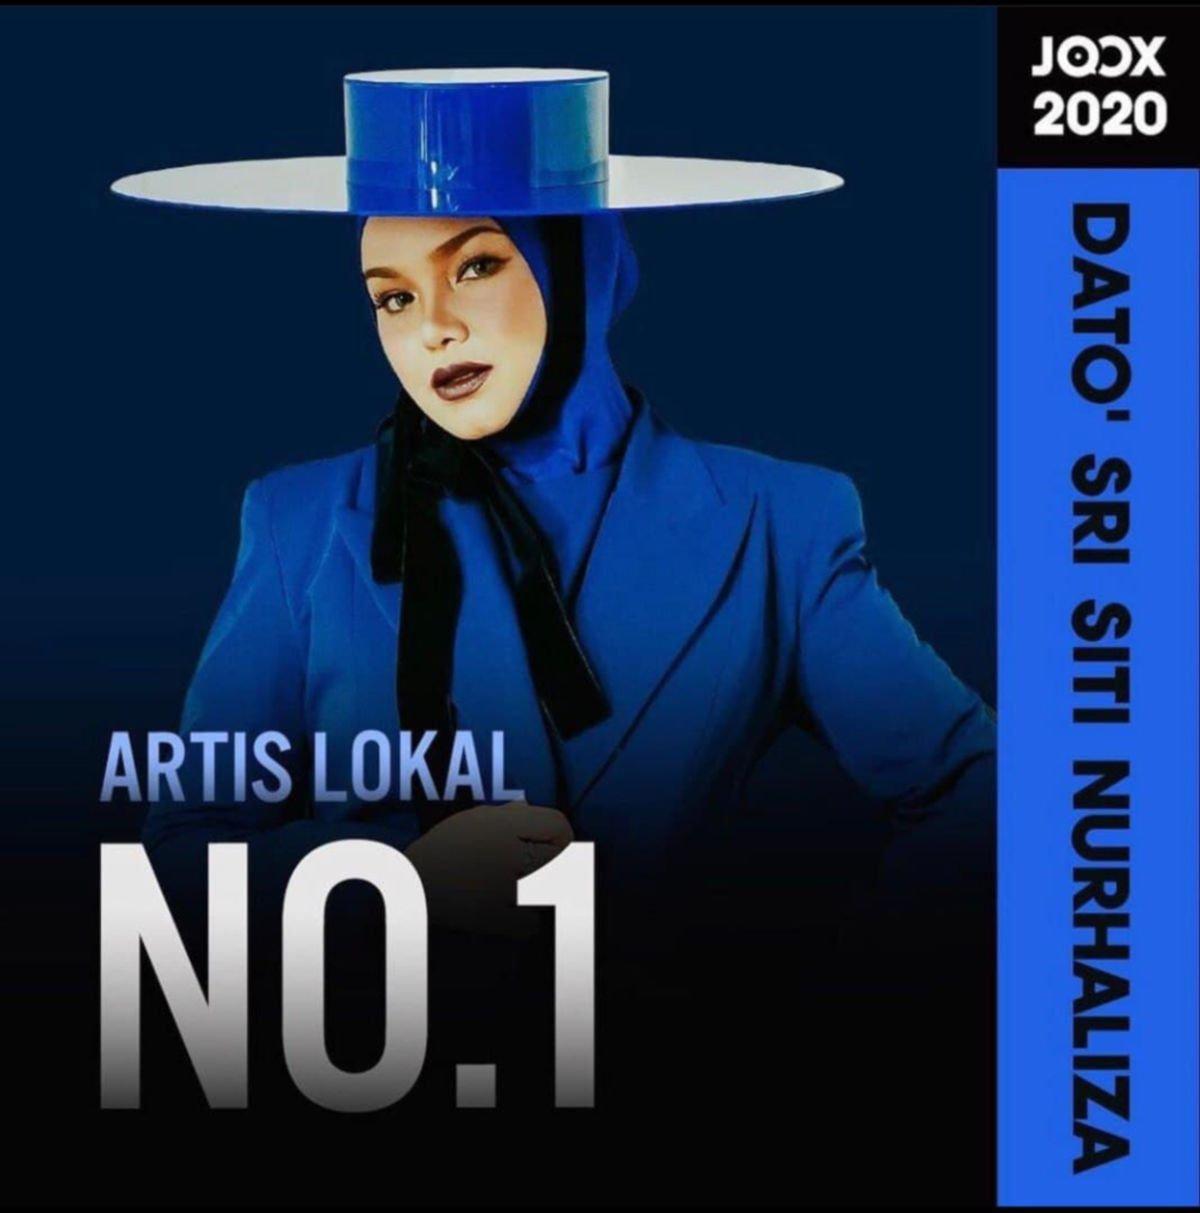 Siti Nurhaliza paling banyak distrim di Joox 3